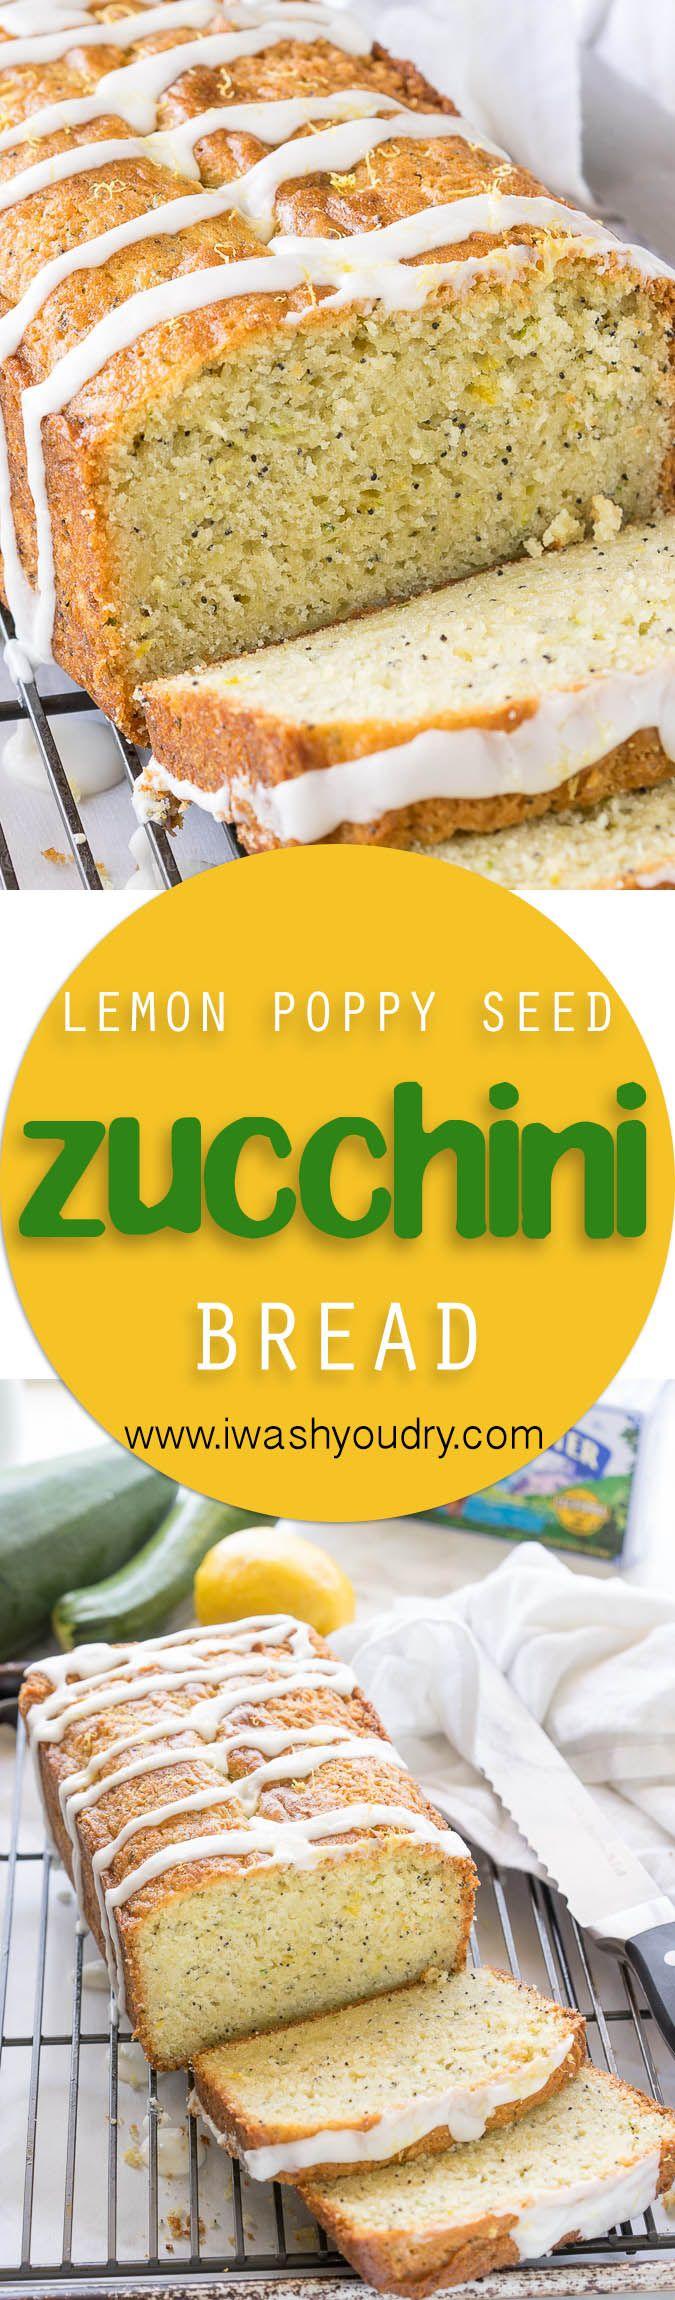 I've already made this Lemon Poppy Seed Zucchini Bread recipe 5 times! It's so good!